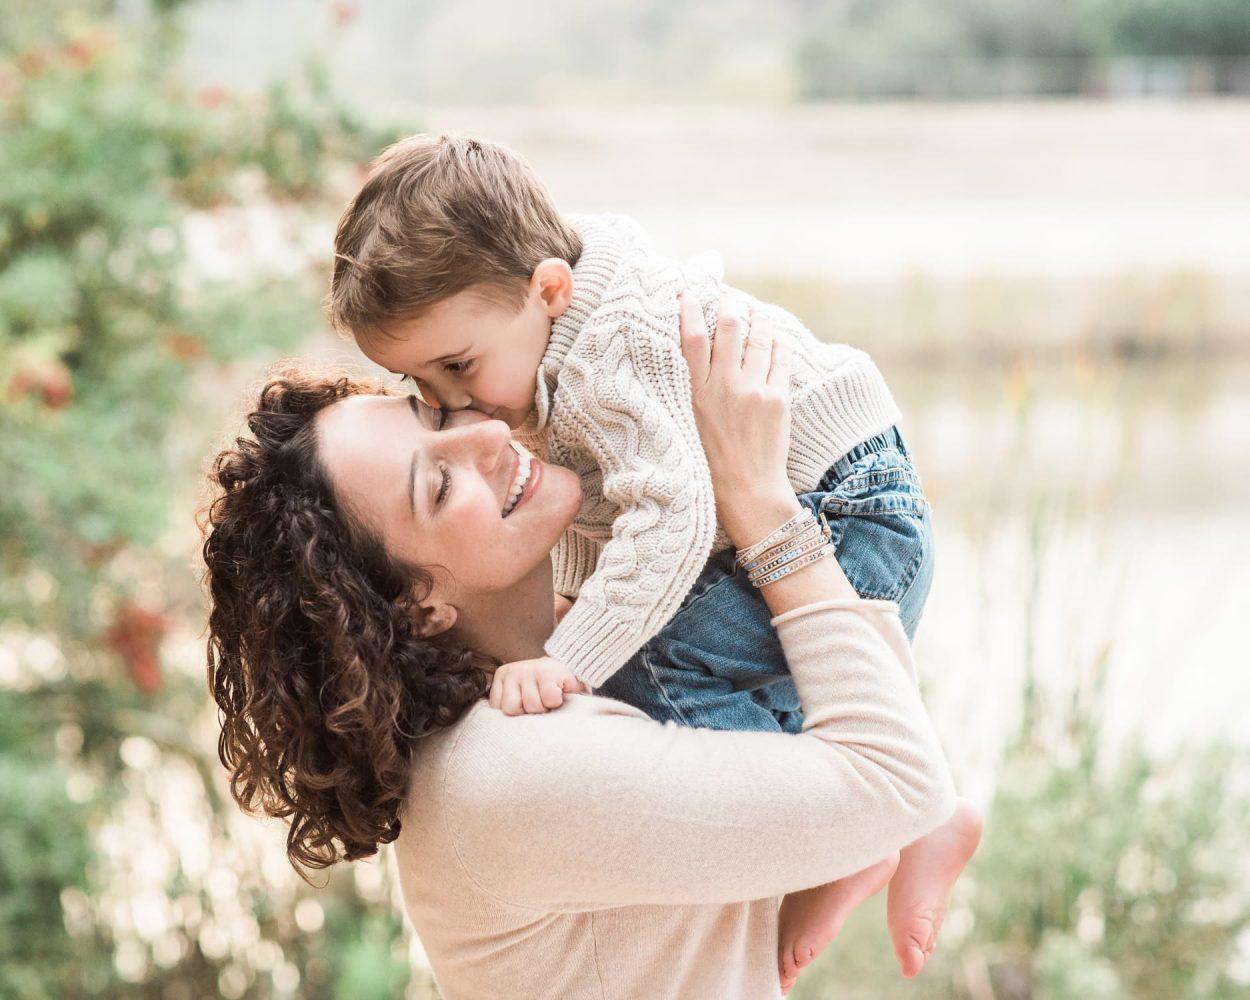 Mother-lifting-toddler-up